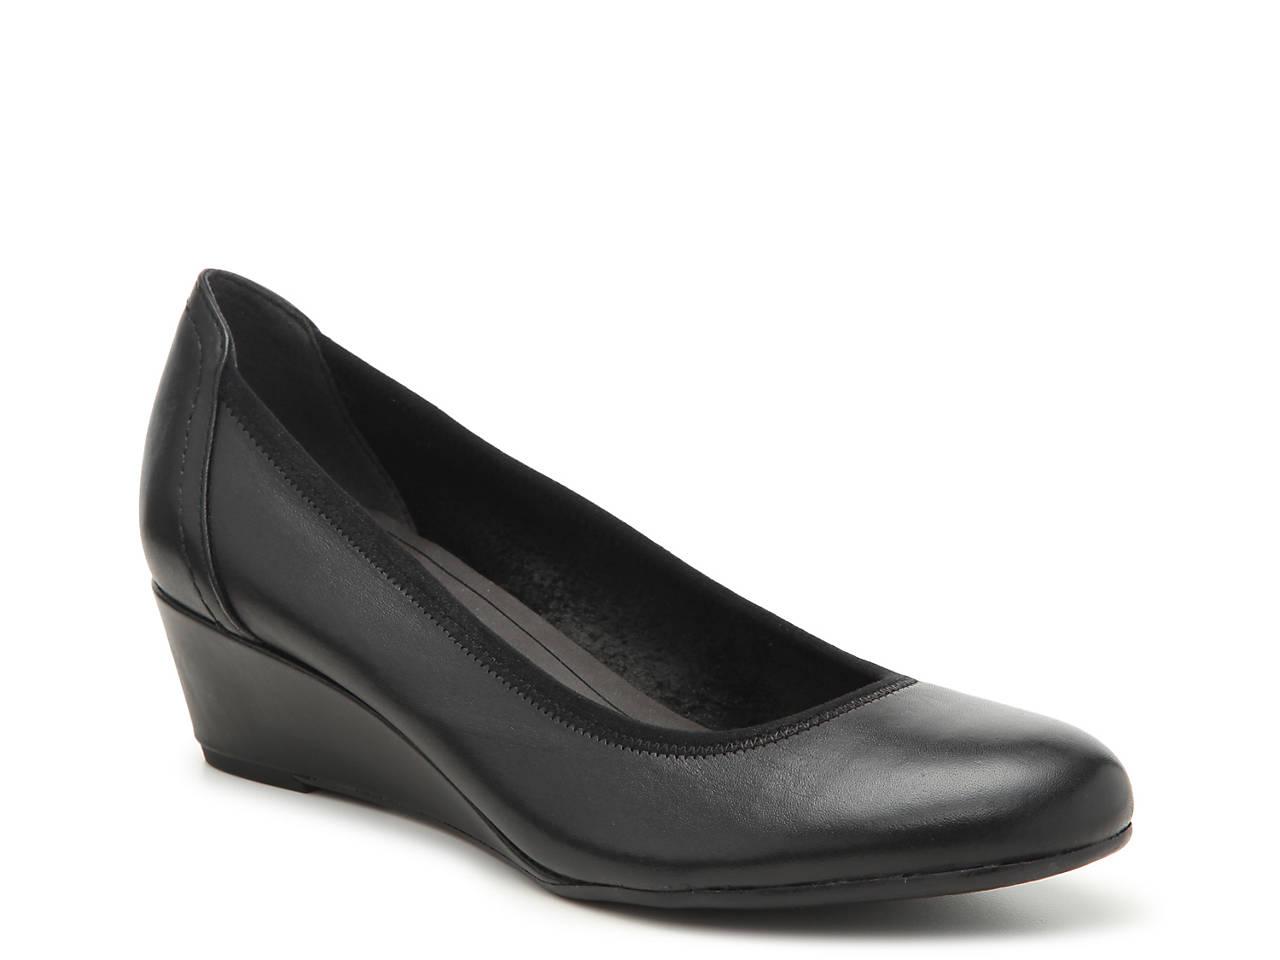 c0abfde28c5 Tamaris RT Wedge Pump Women s Shoes